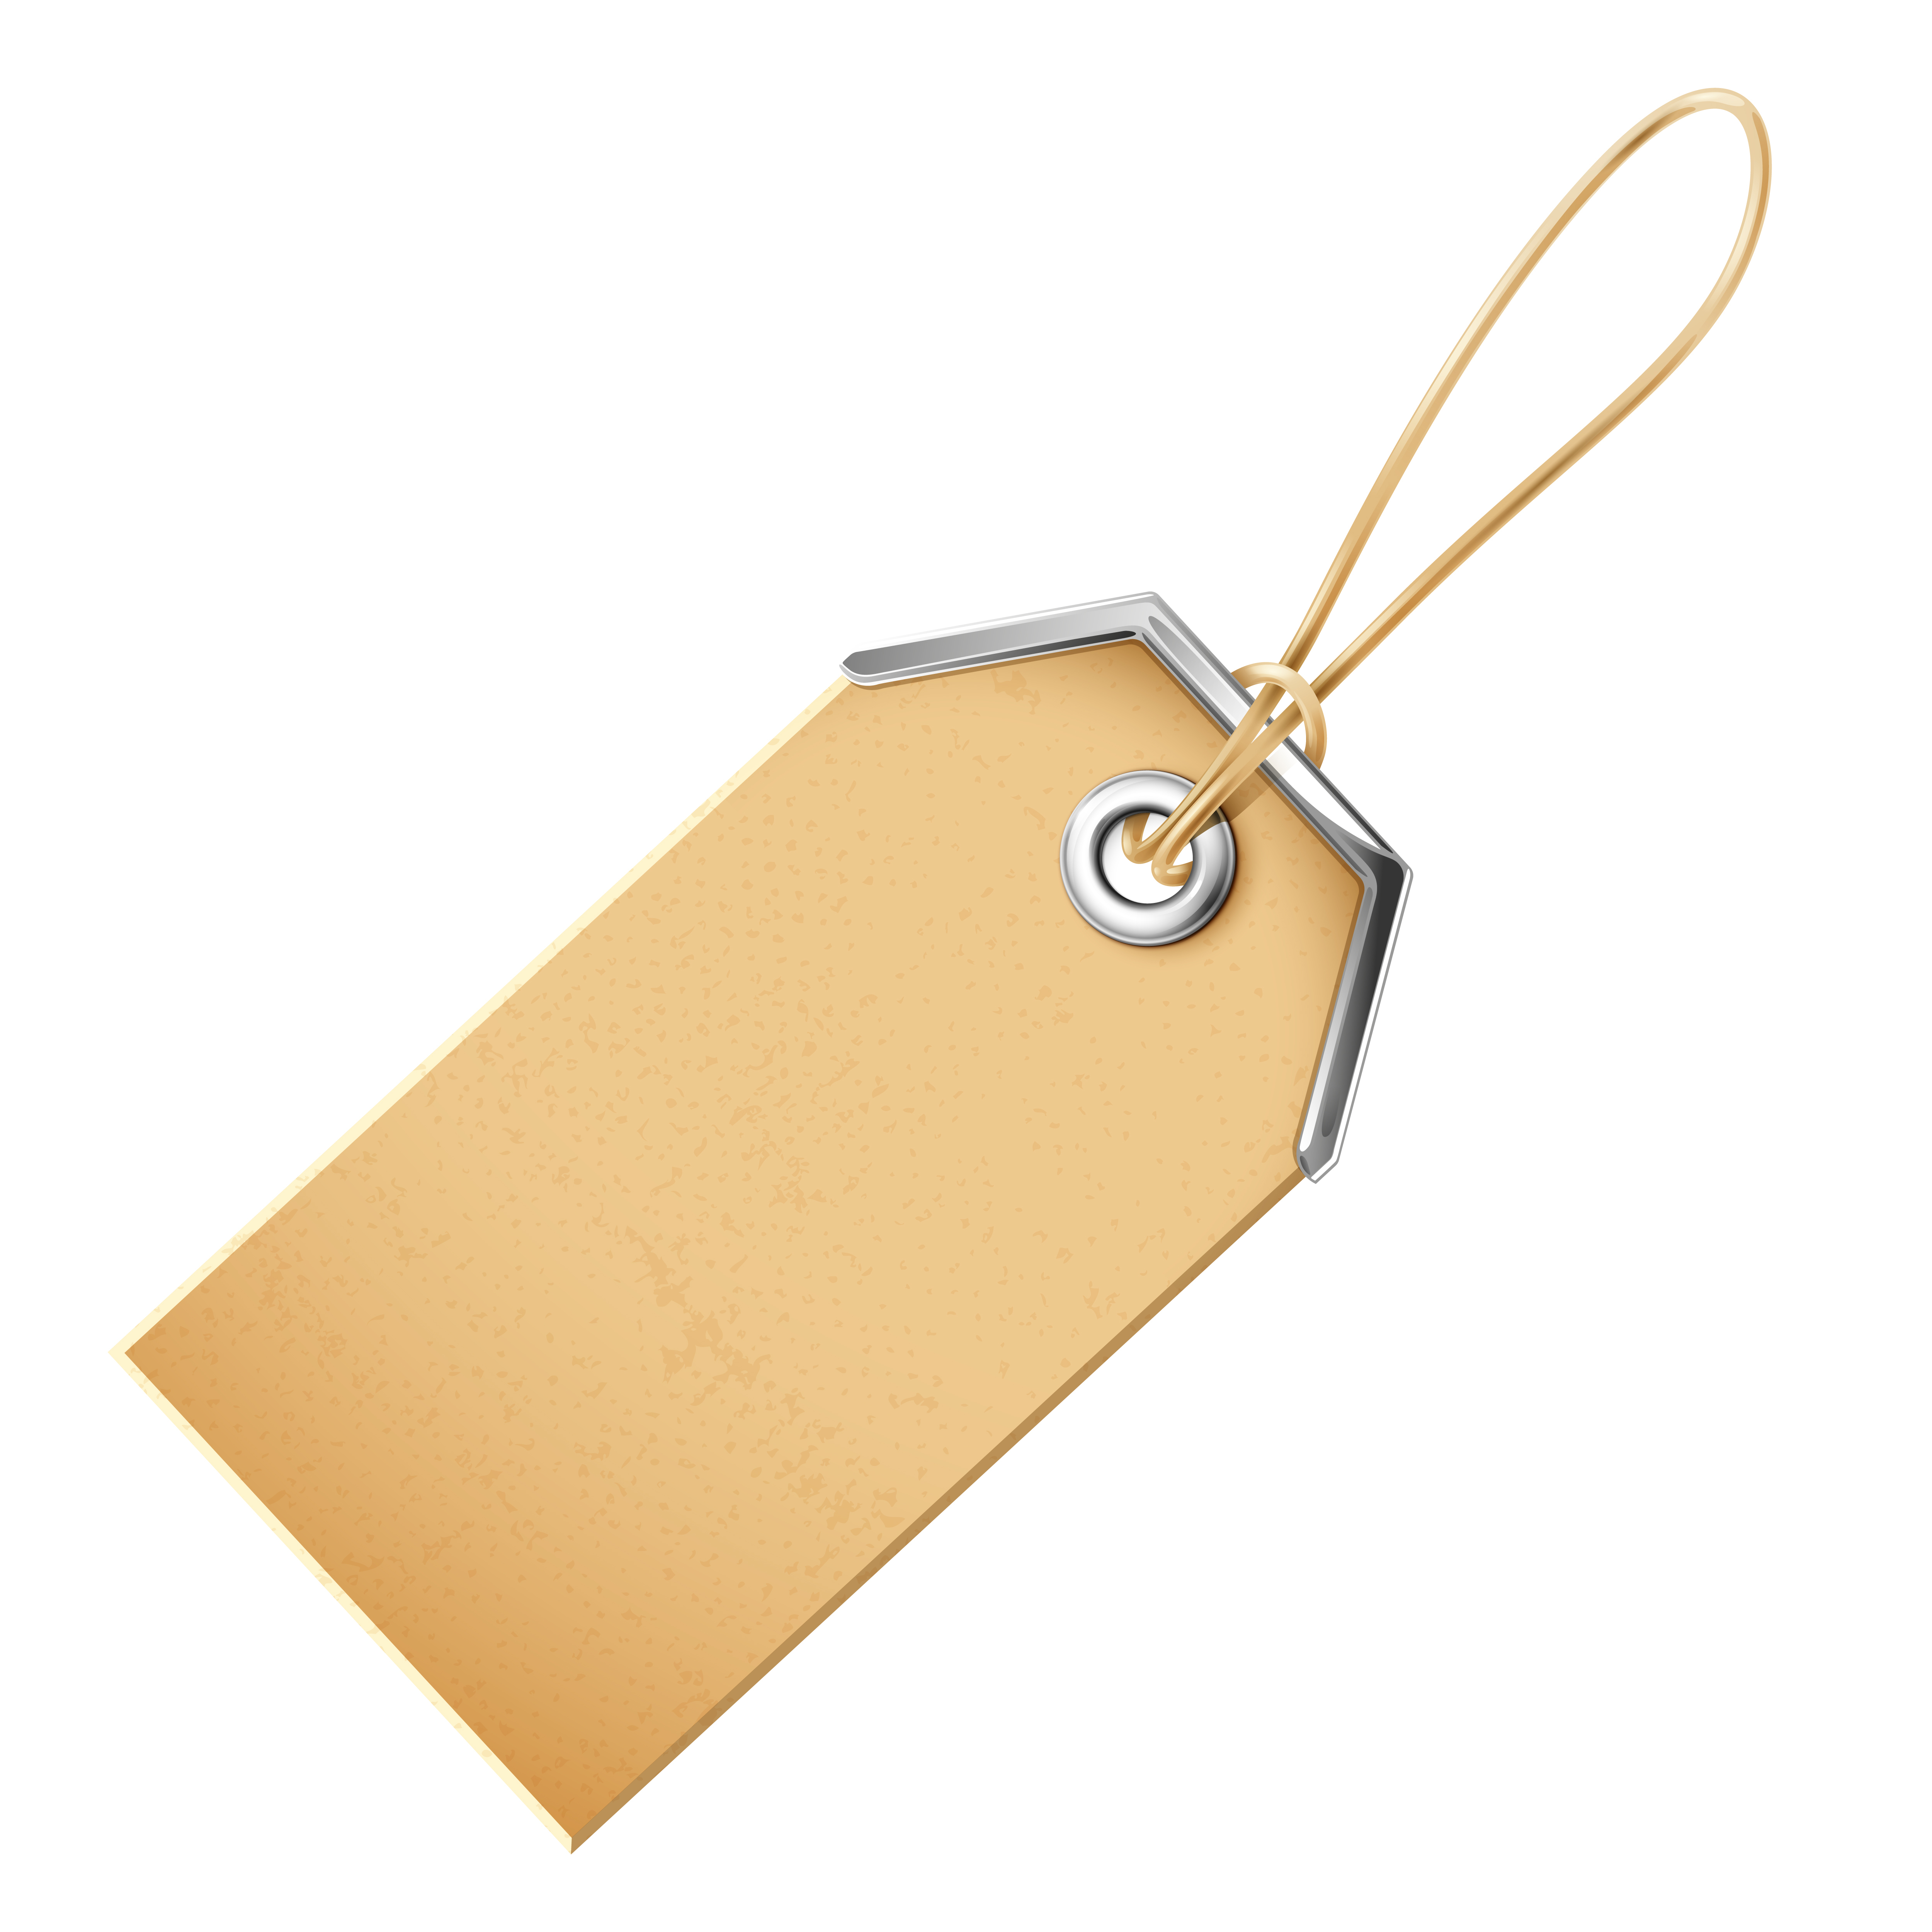 Fashion hang tags